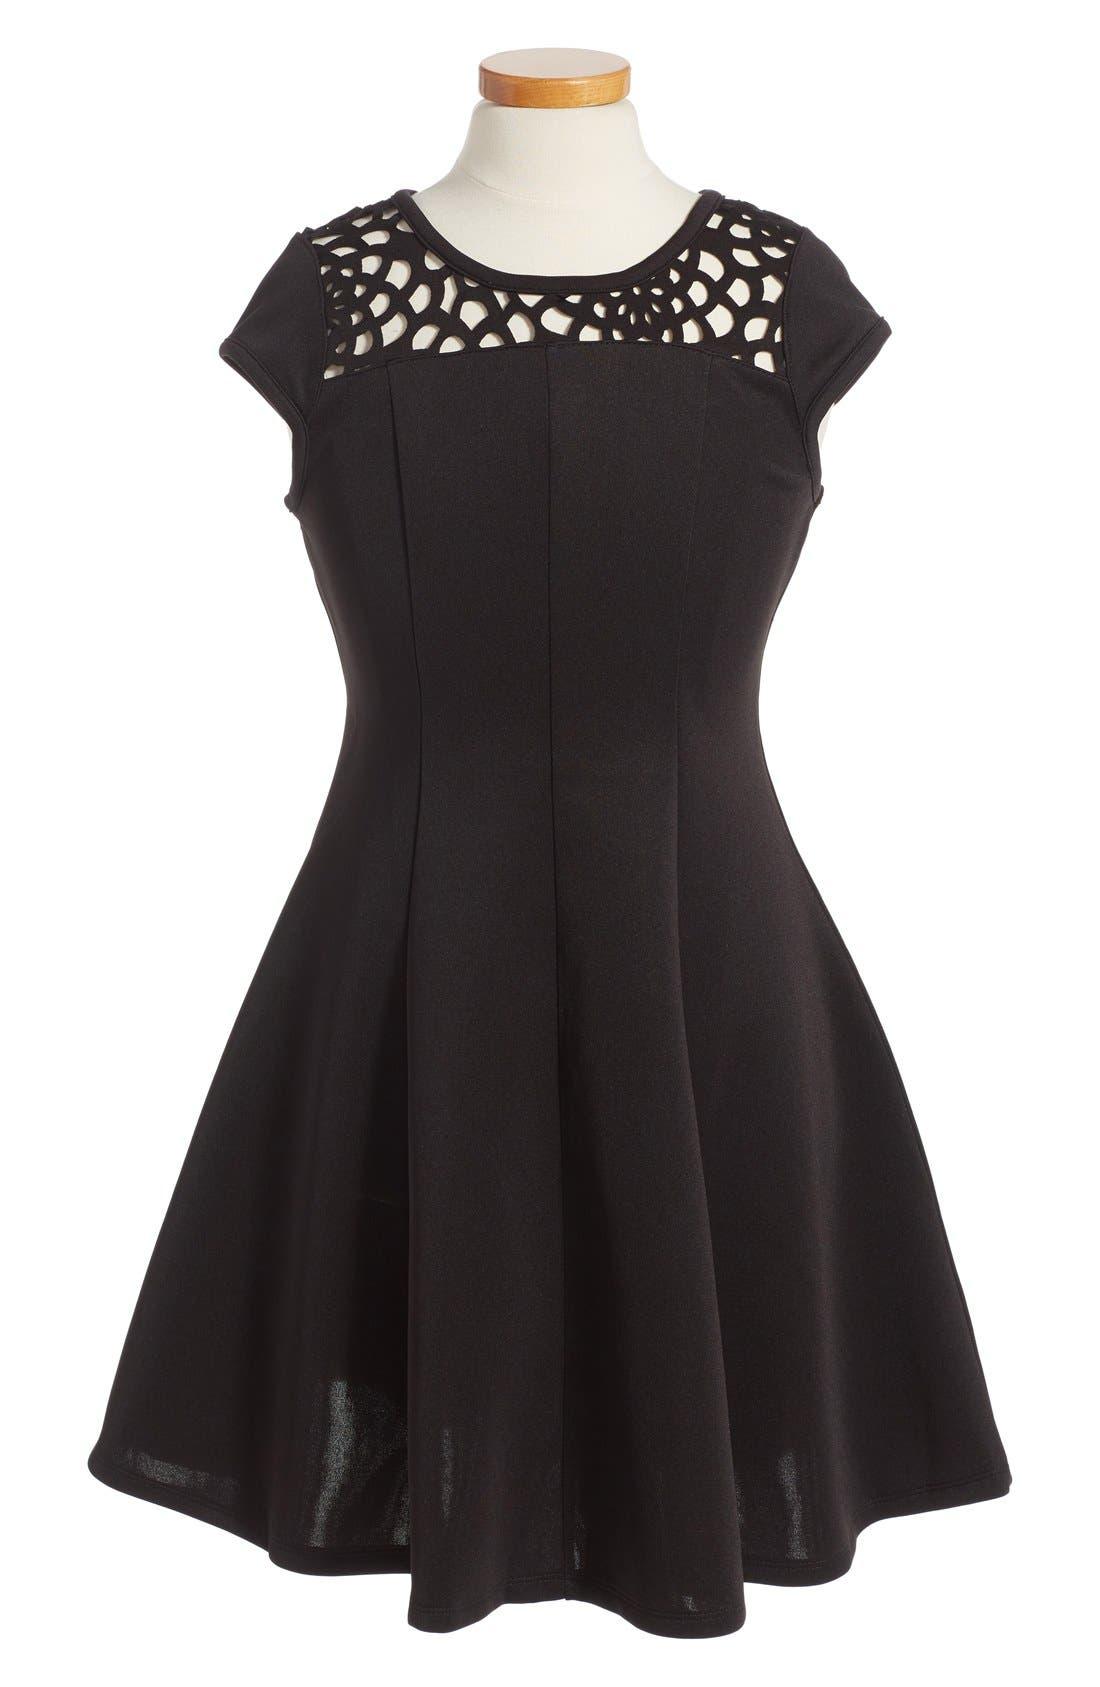 Alternate Image 1 Selected - Ten Sixty Sherman Cap Sleeve Dress (Big Girls)